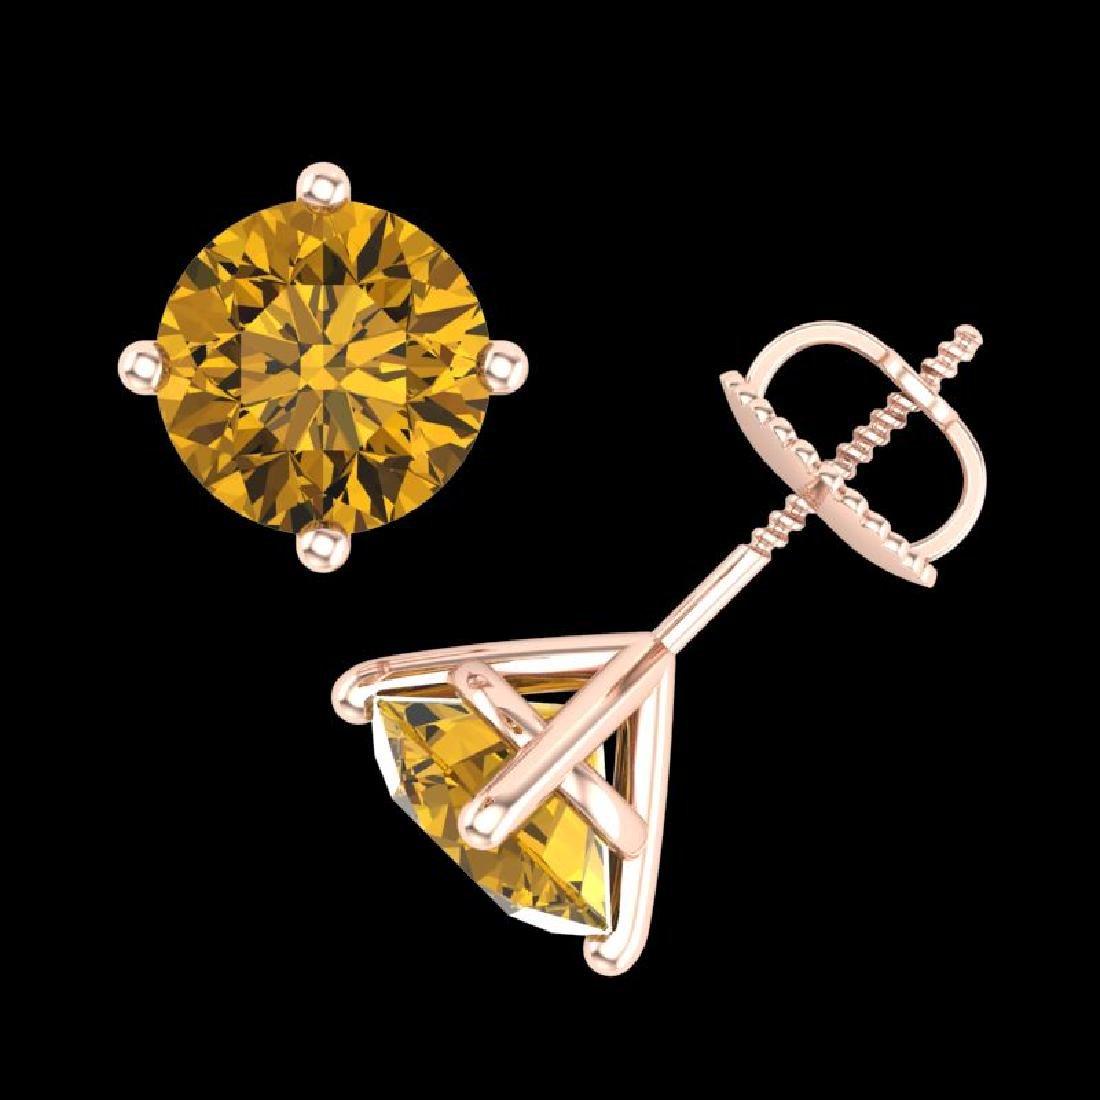 3.01 CTW Intense Fancy Yellow Diamond Art Deco Stud - 3